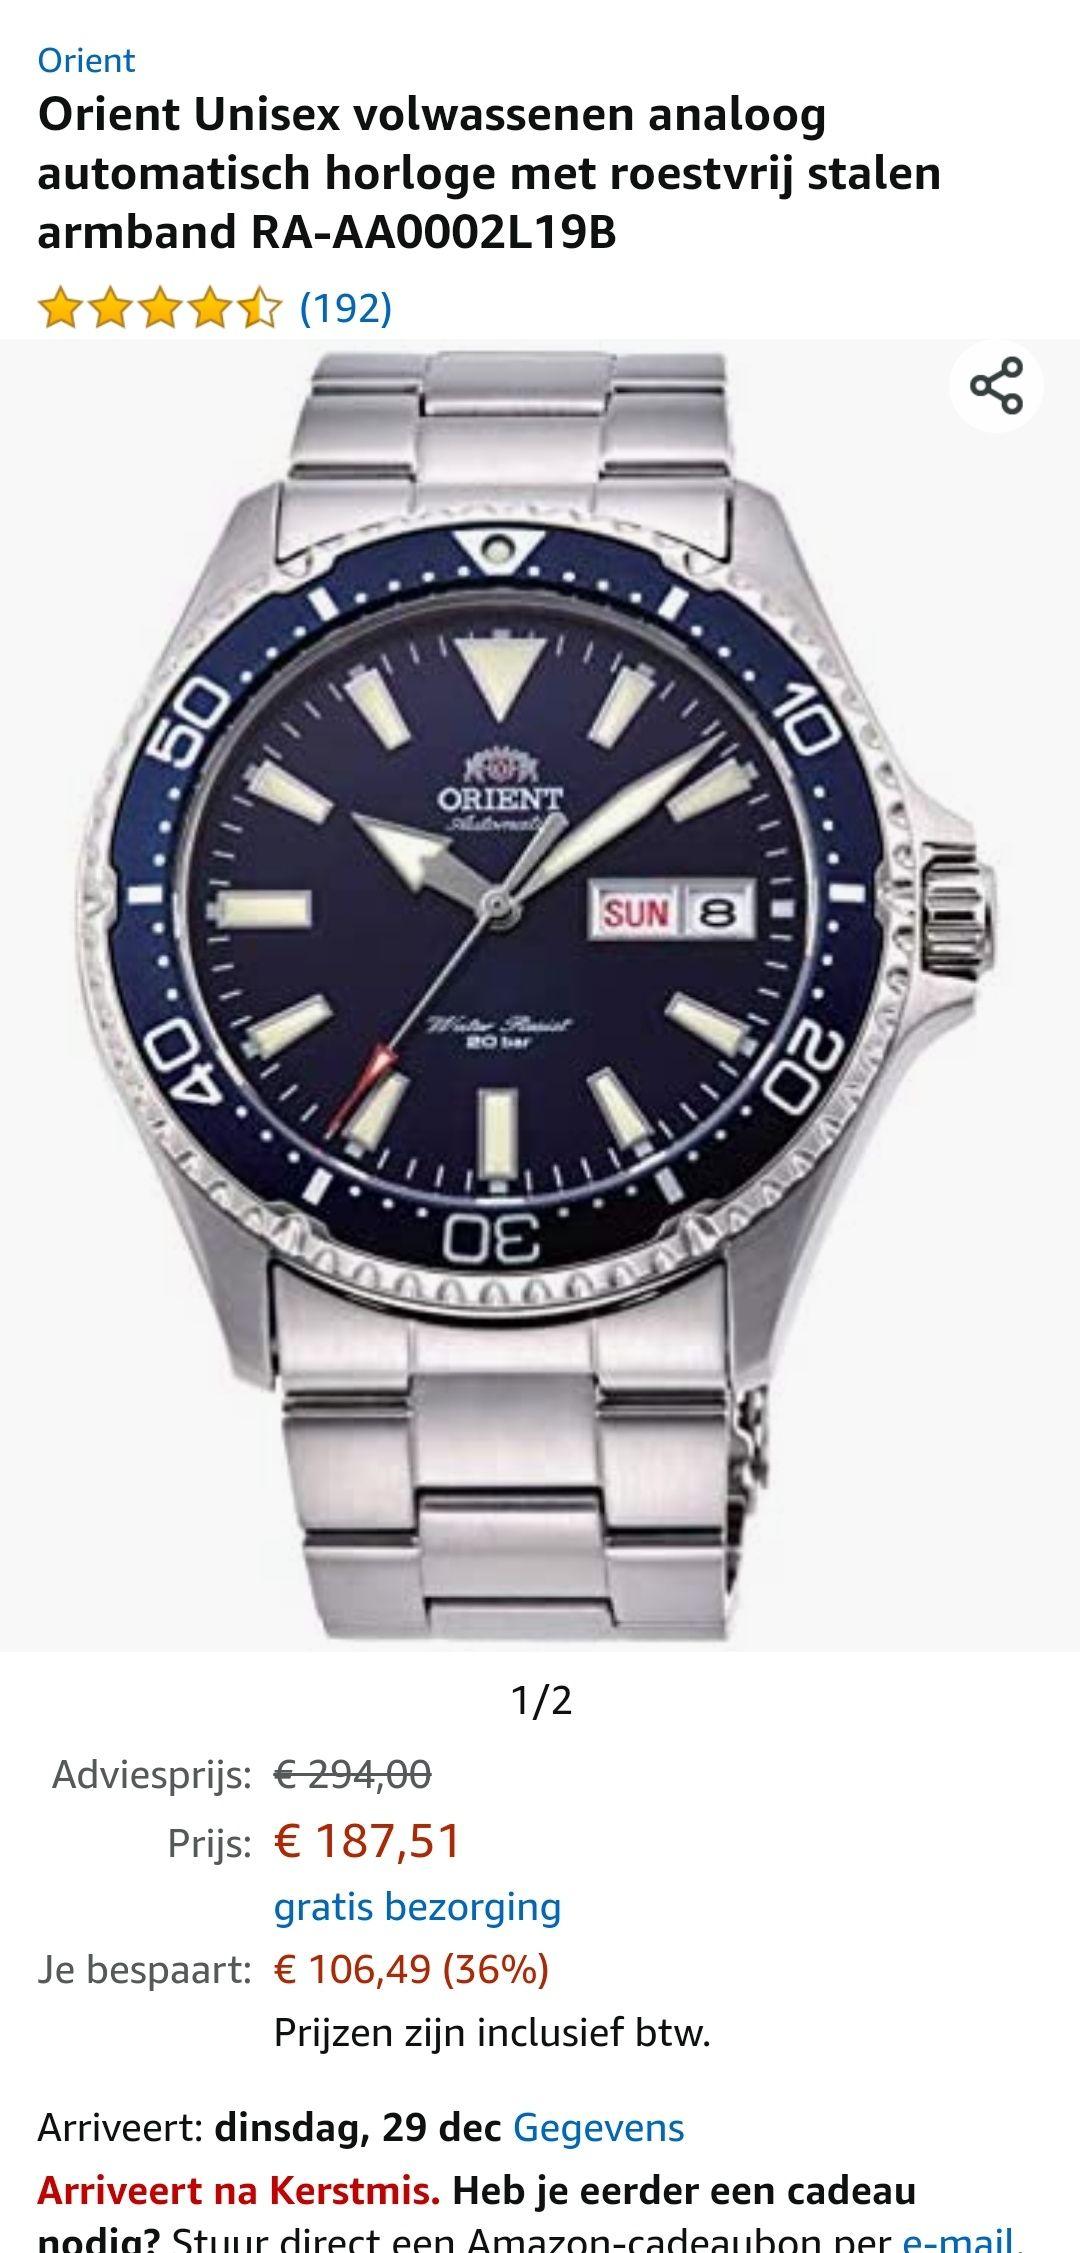 Orient Unisex - RA-AA0002L19B